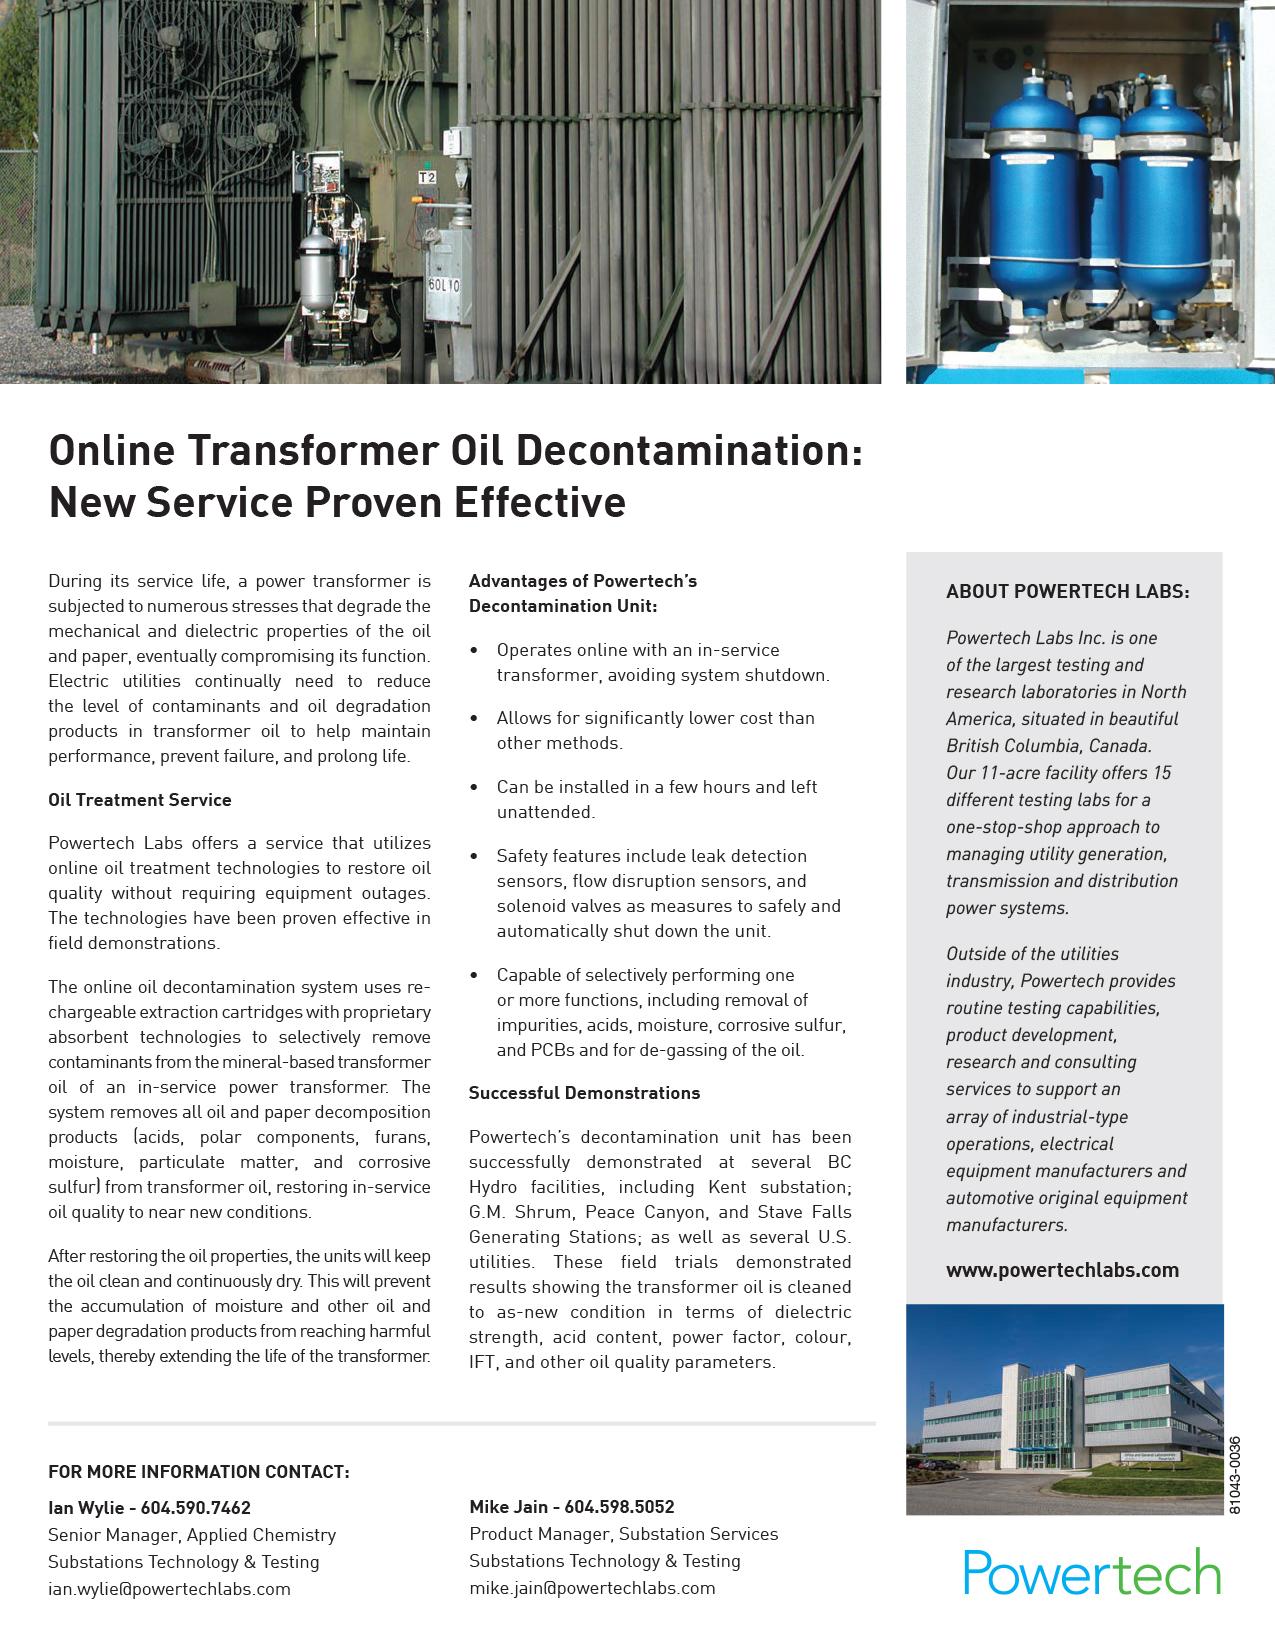 IN-SERVICE TRANSFORMER DECONTAMINATION UNIT — Powertech Labs